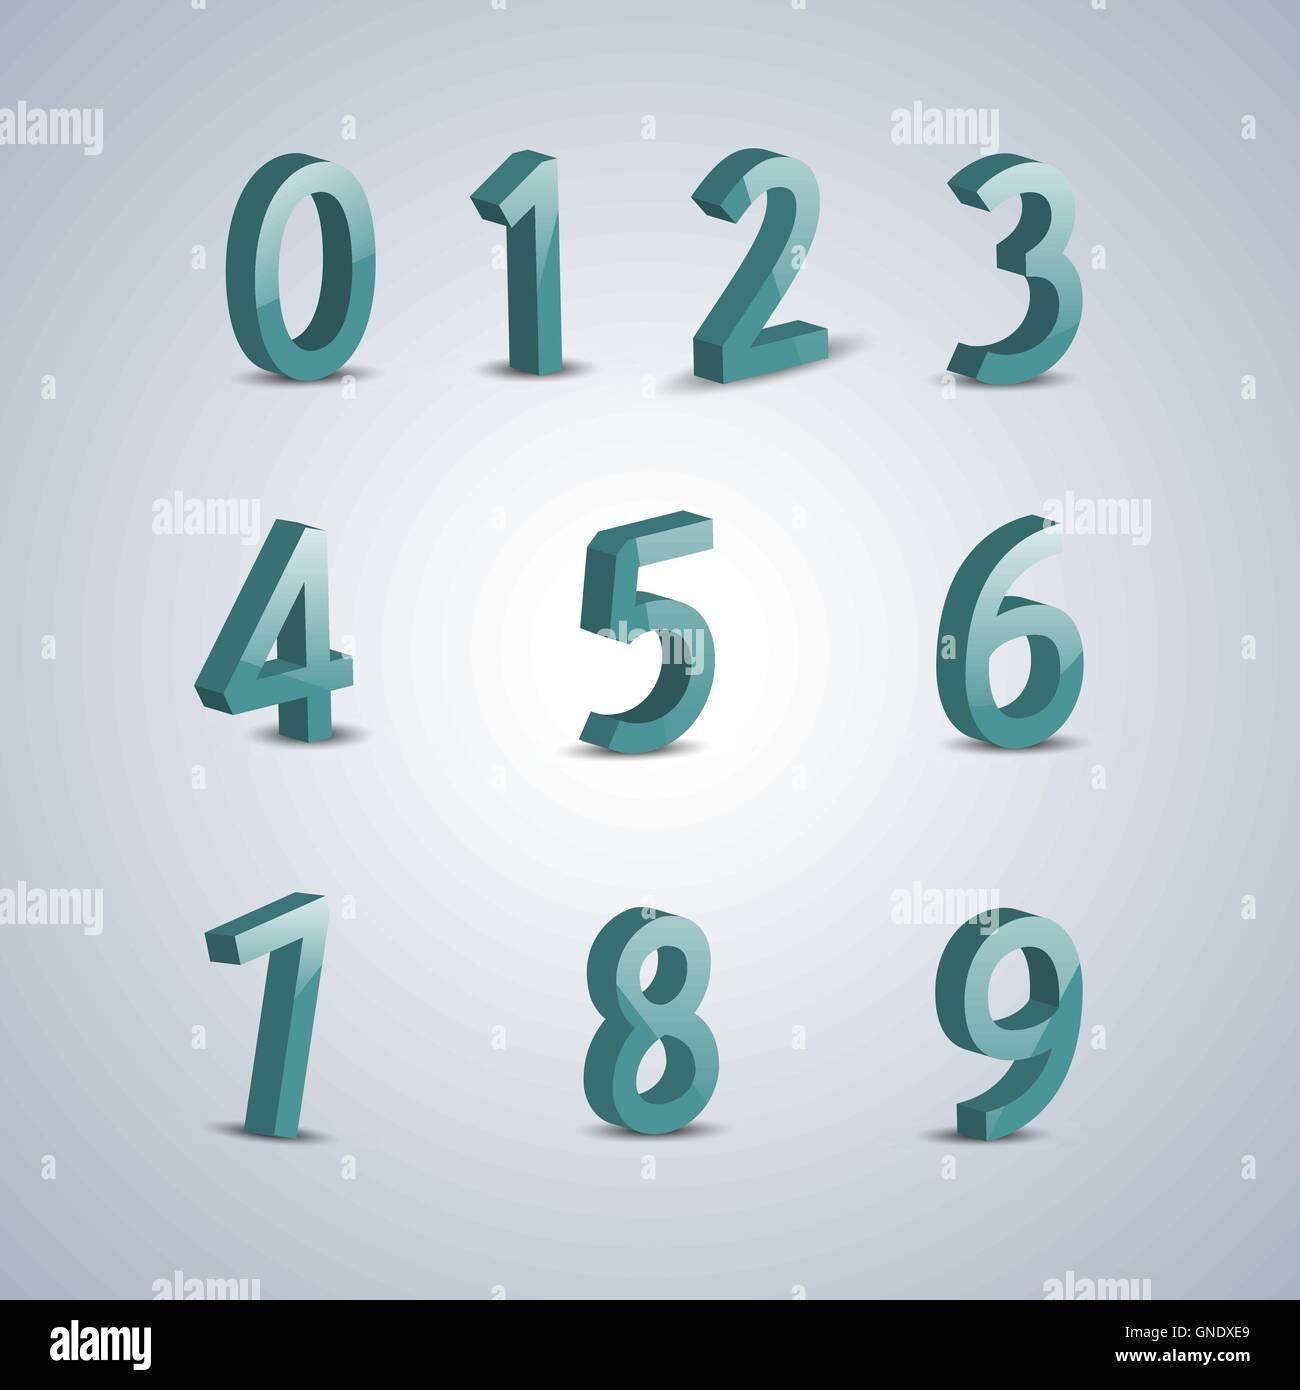 Volumetric numerals, vector illustration. - Stock Image